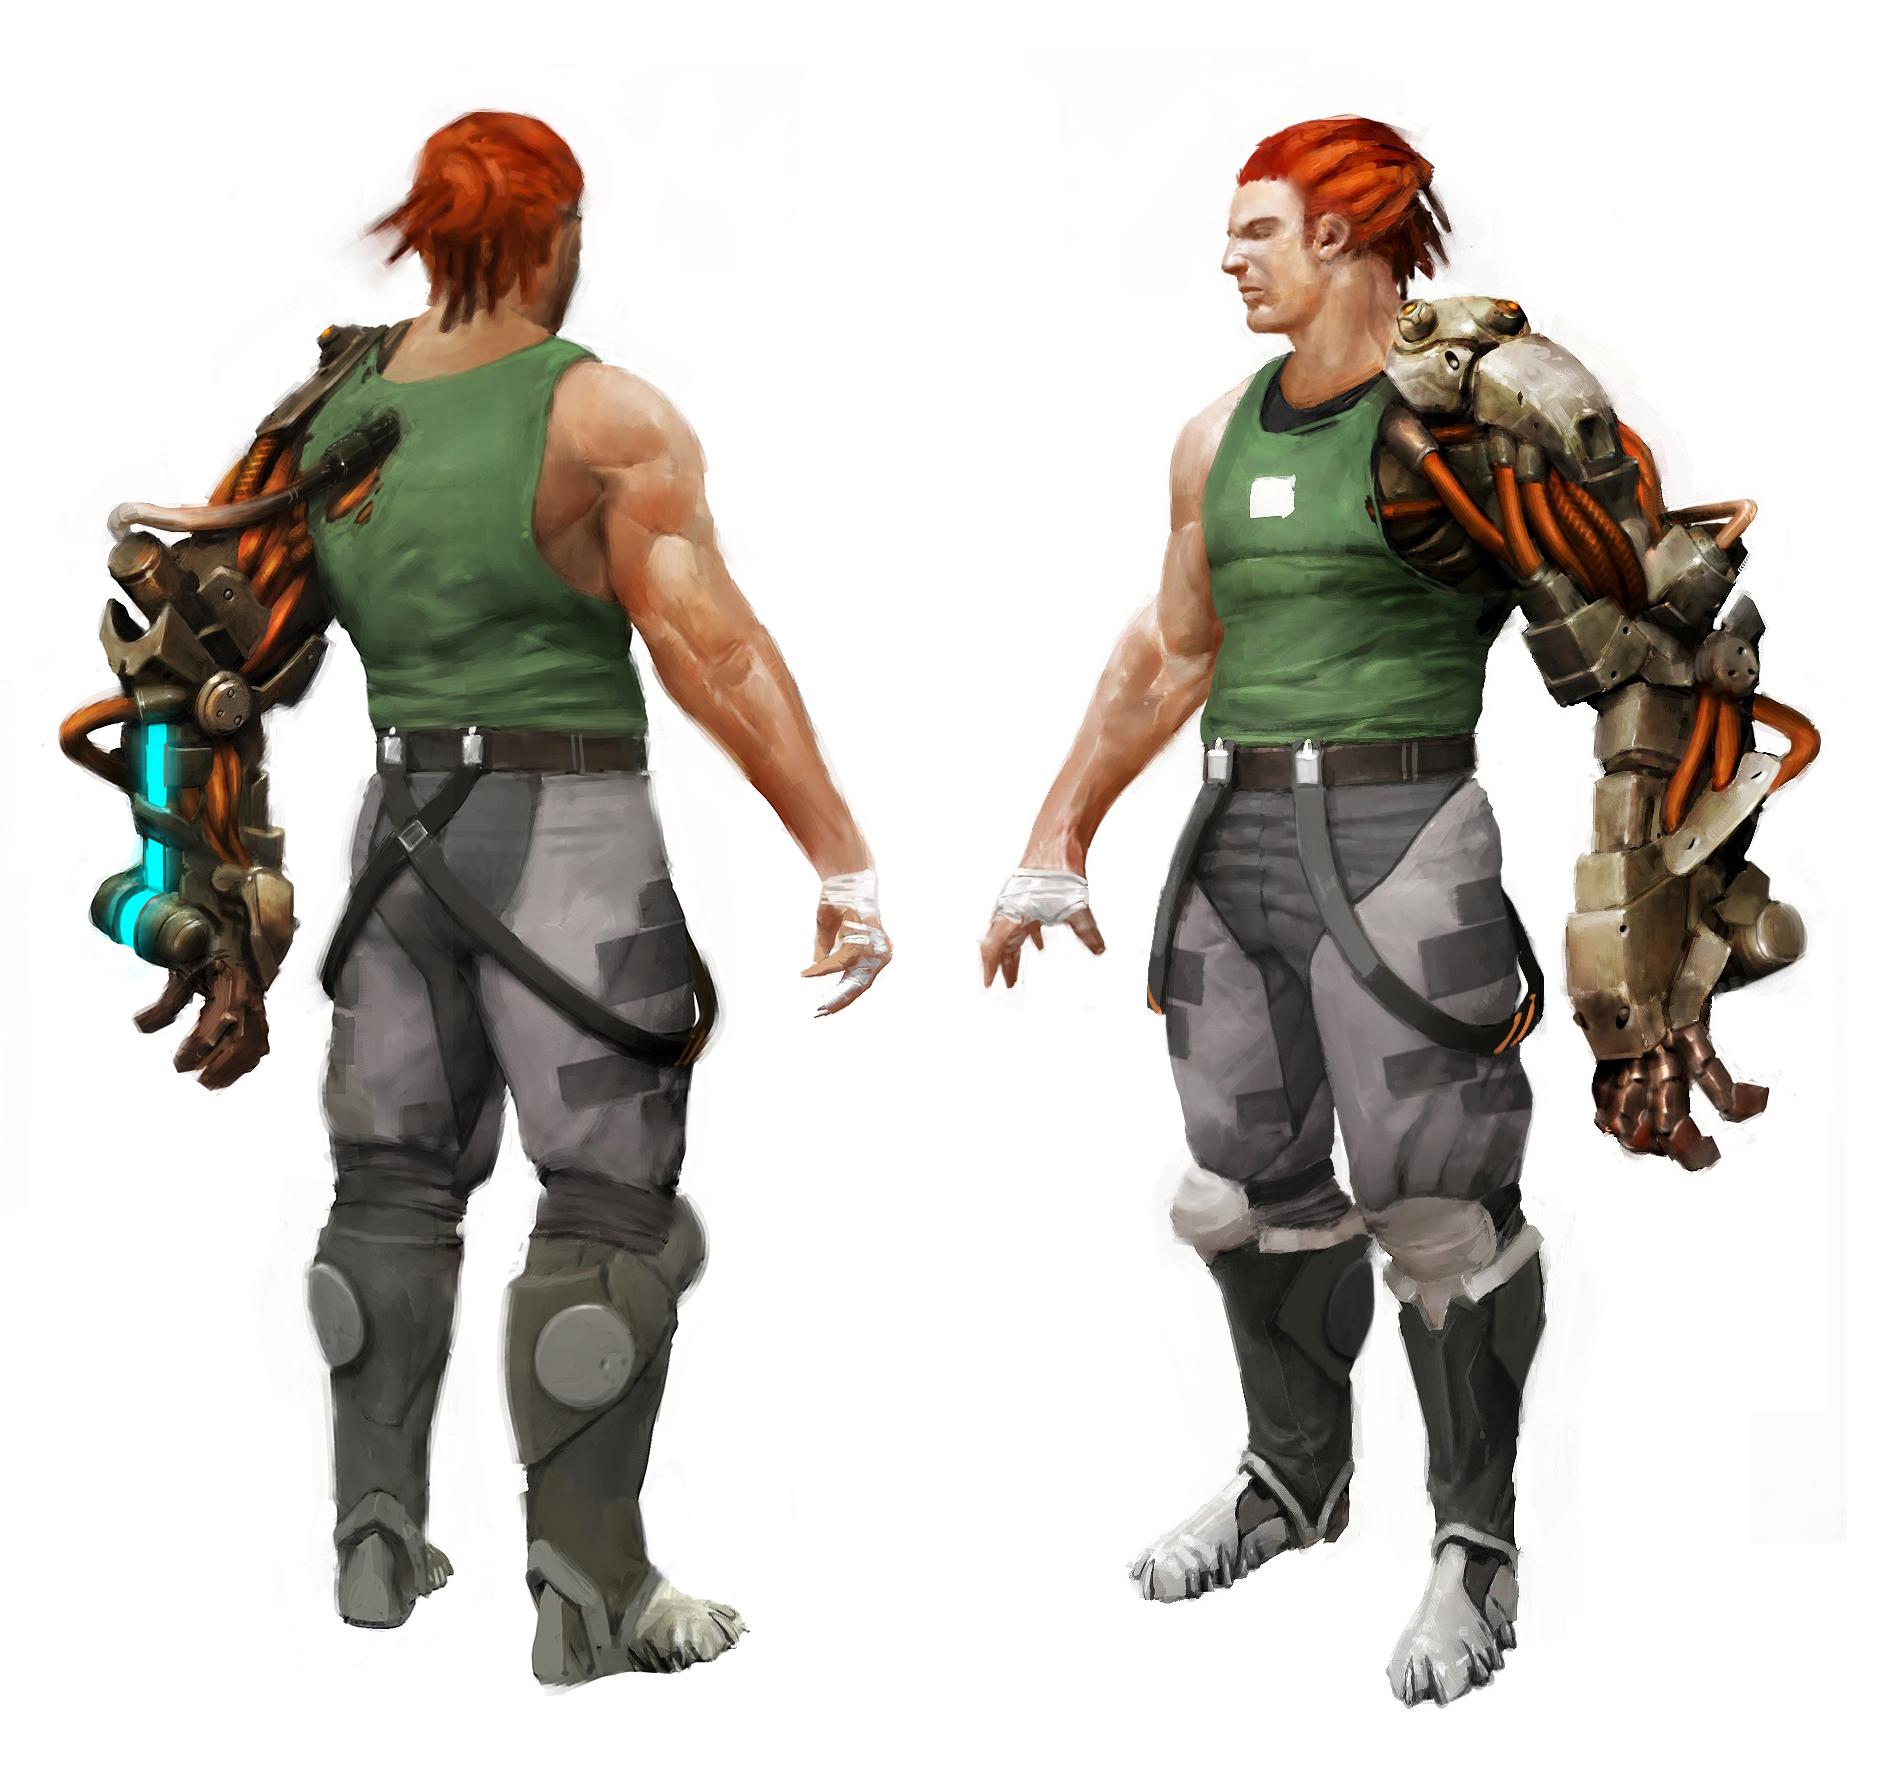 Bionic Commando Concept Art - Nathan Rad Spencer 01.jpg